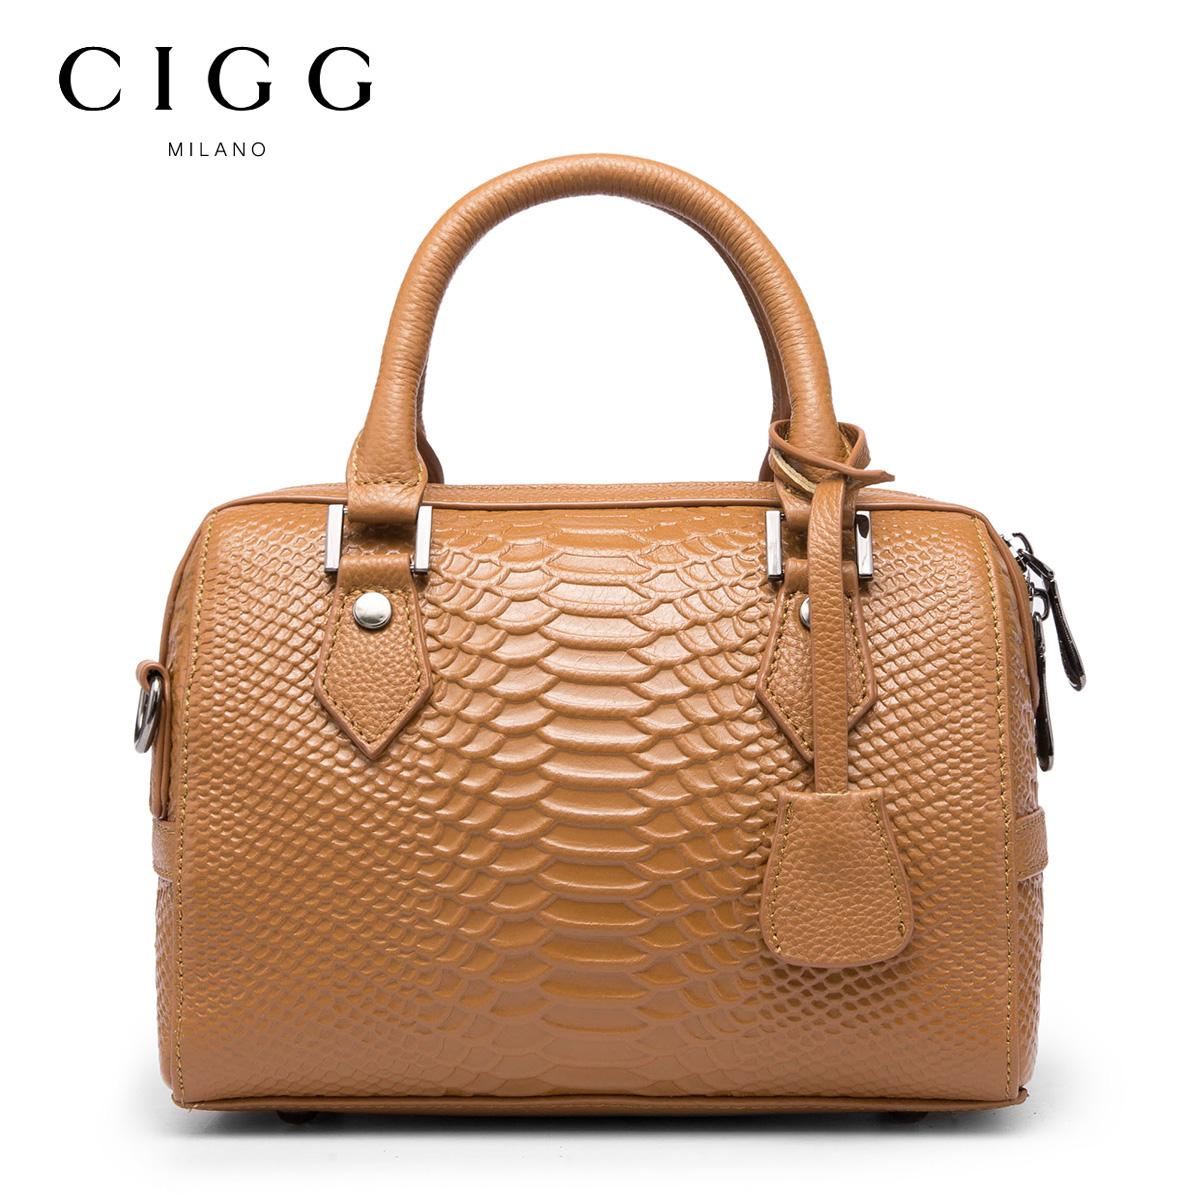 CIGG/西歌真皮女包 头层牛皮蛇纹休闲波士顿手提包小包斜挎包欧美